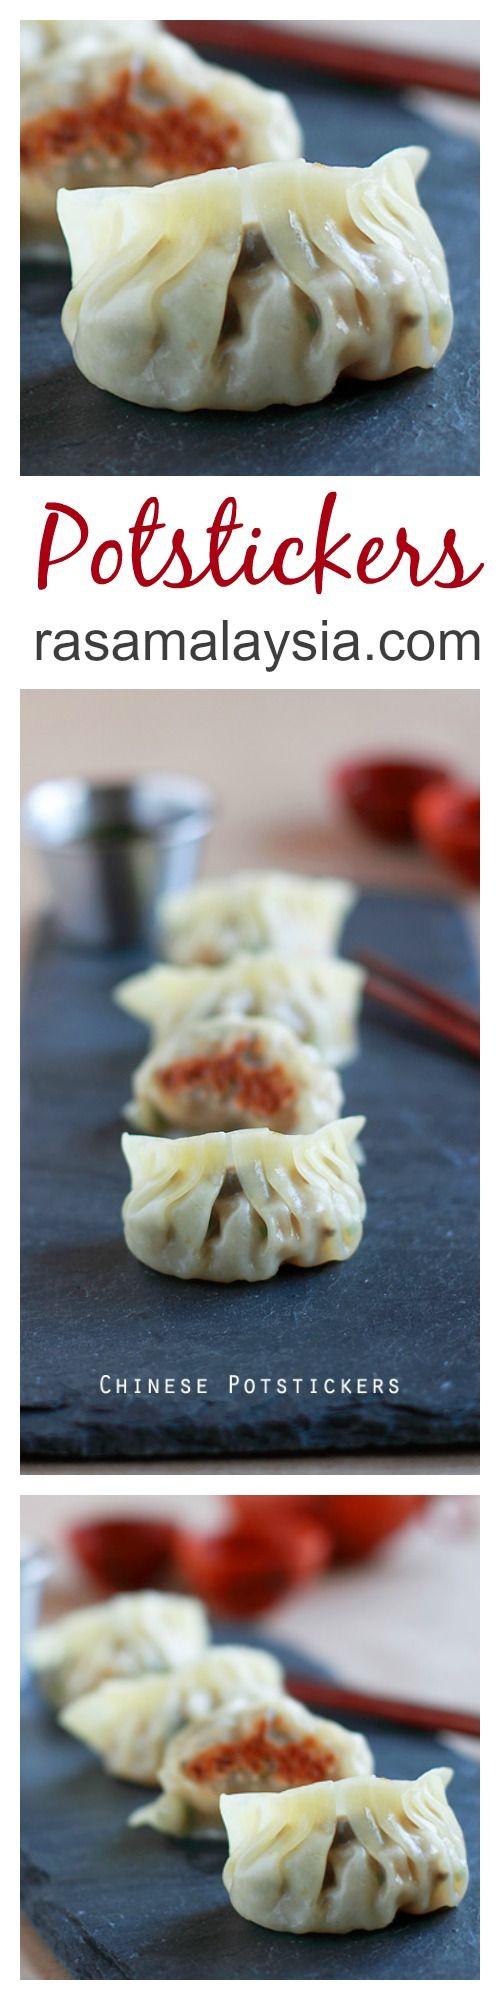 Potstickers | Recipe | Chinese Dumplings, Ground Meat and Dumplings